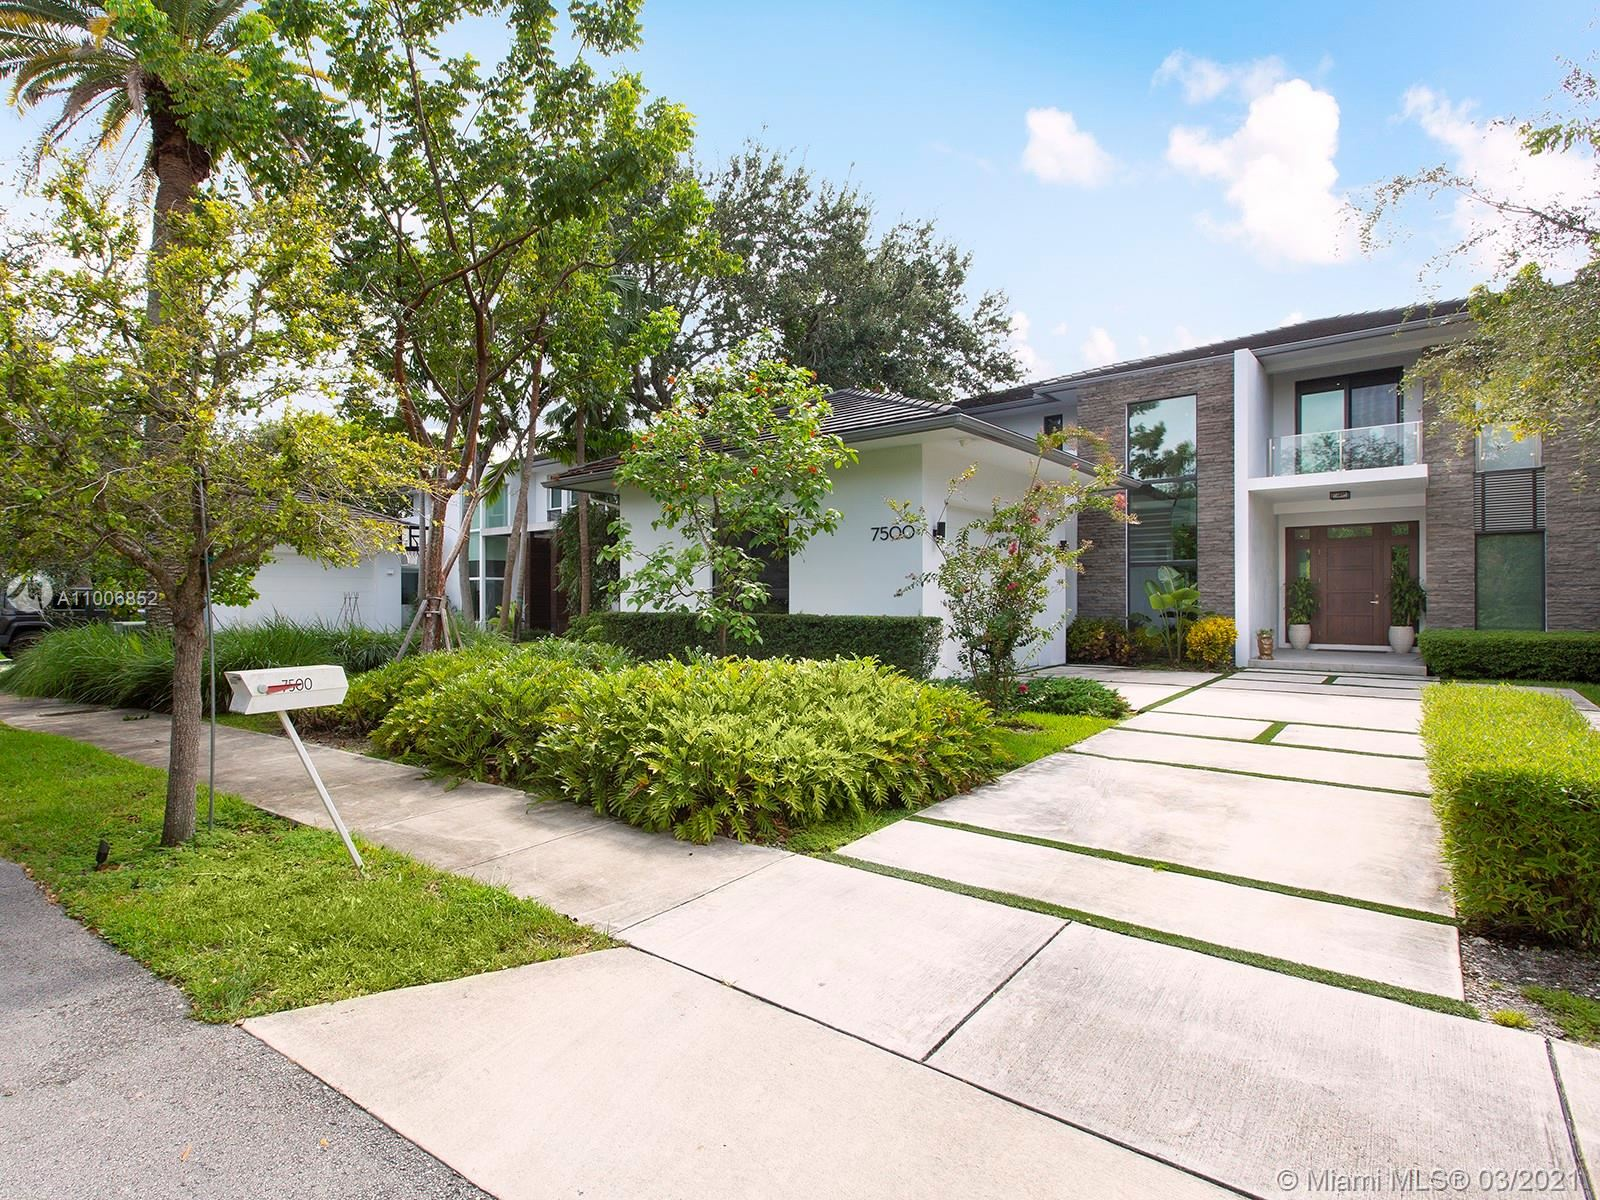 Photo of 7500 SW 57th Ct, South Miami, FL 33143 (MLS # A11006852)